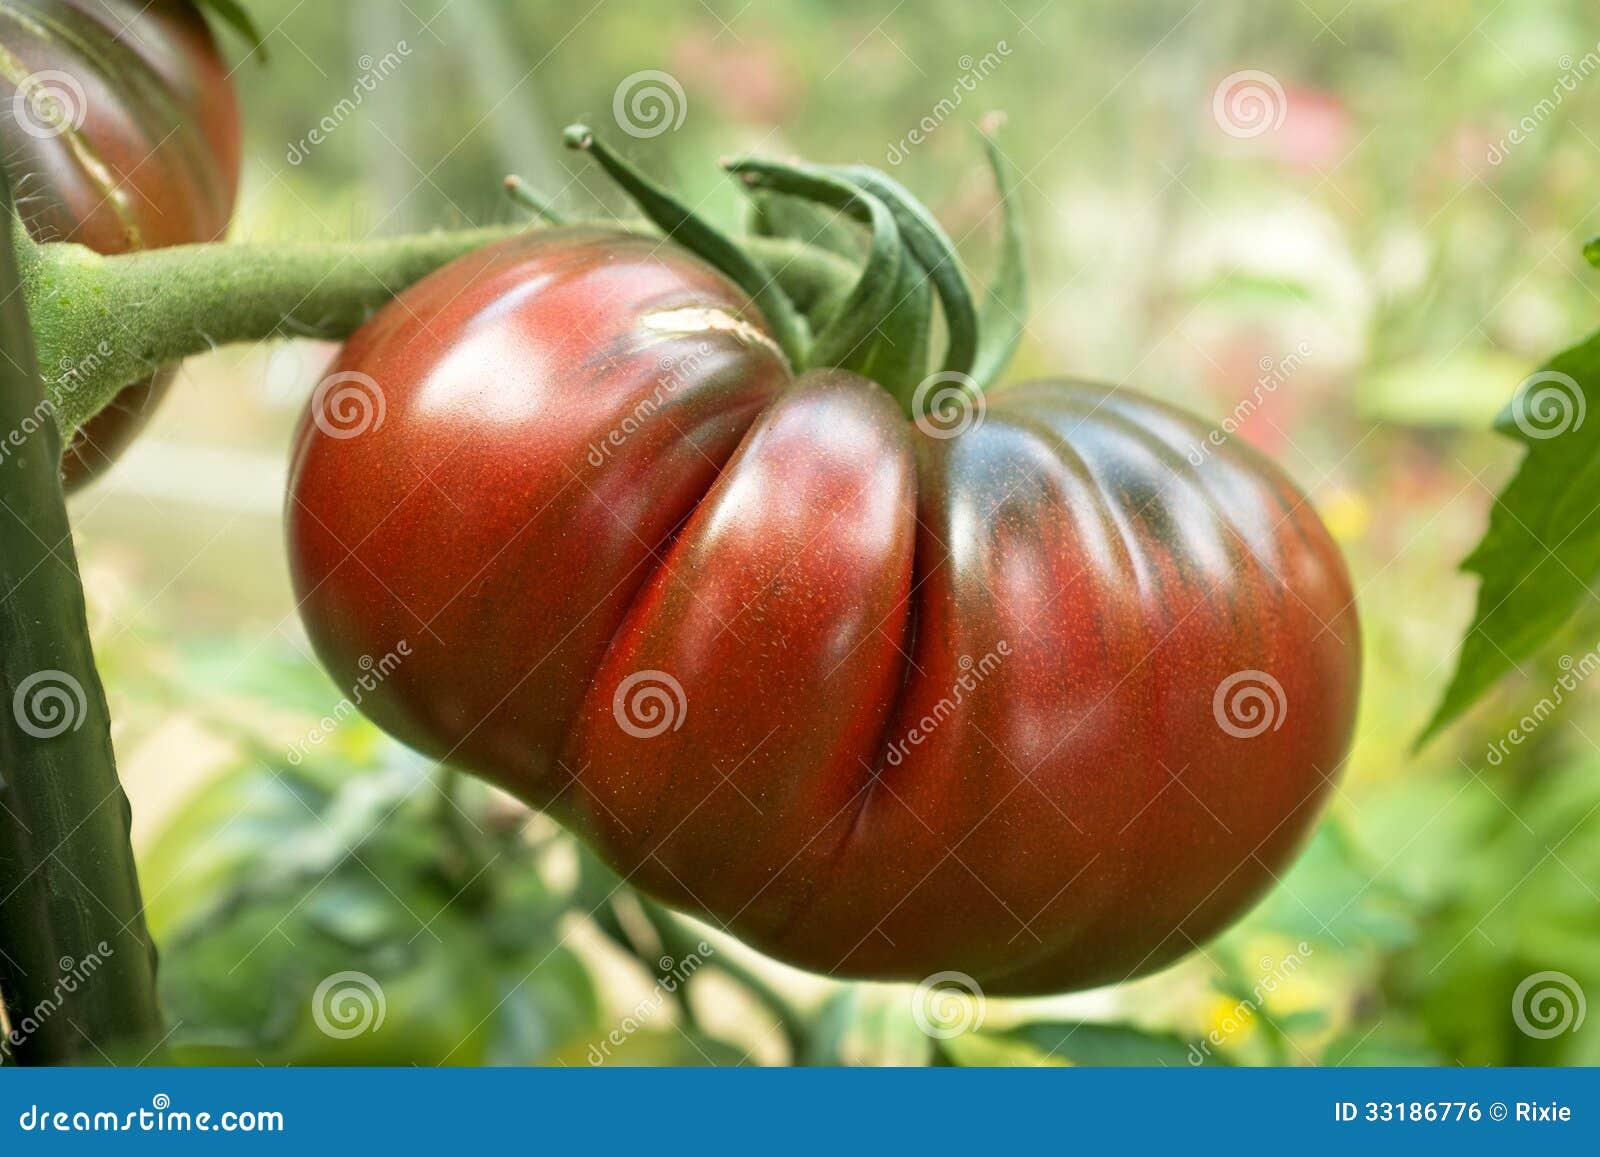 black russian tomato stock photo image of crop closeup 33186776. Black Bedroom Furniture Sets. Home Design Ideas